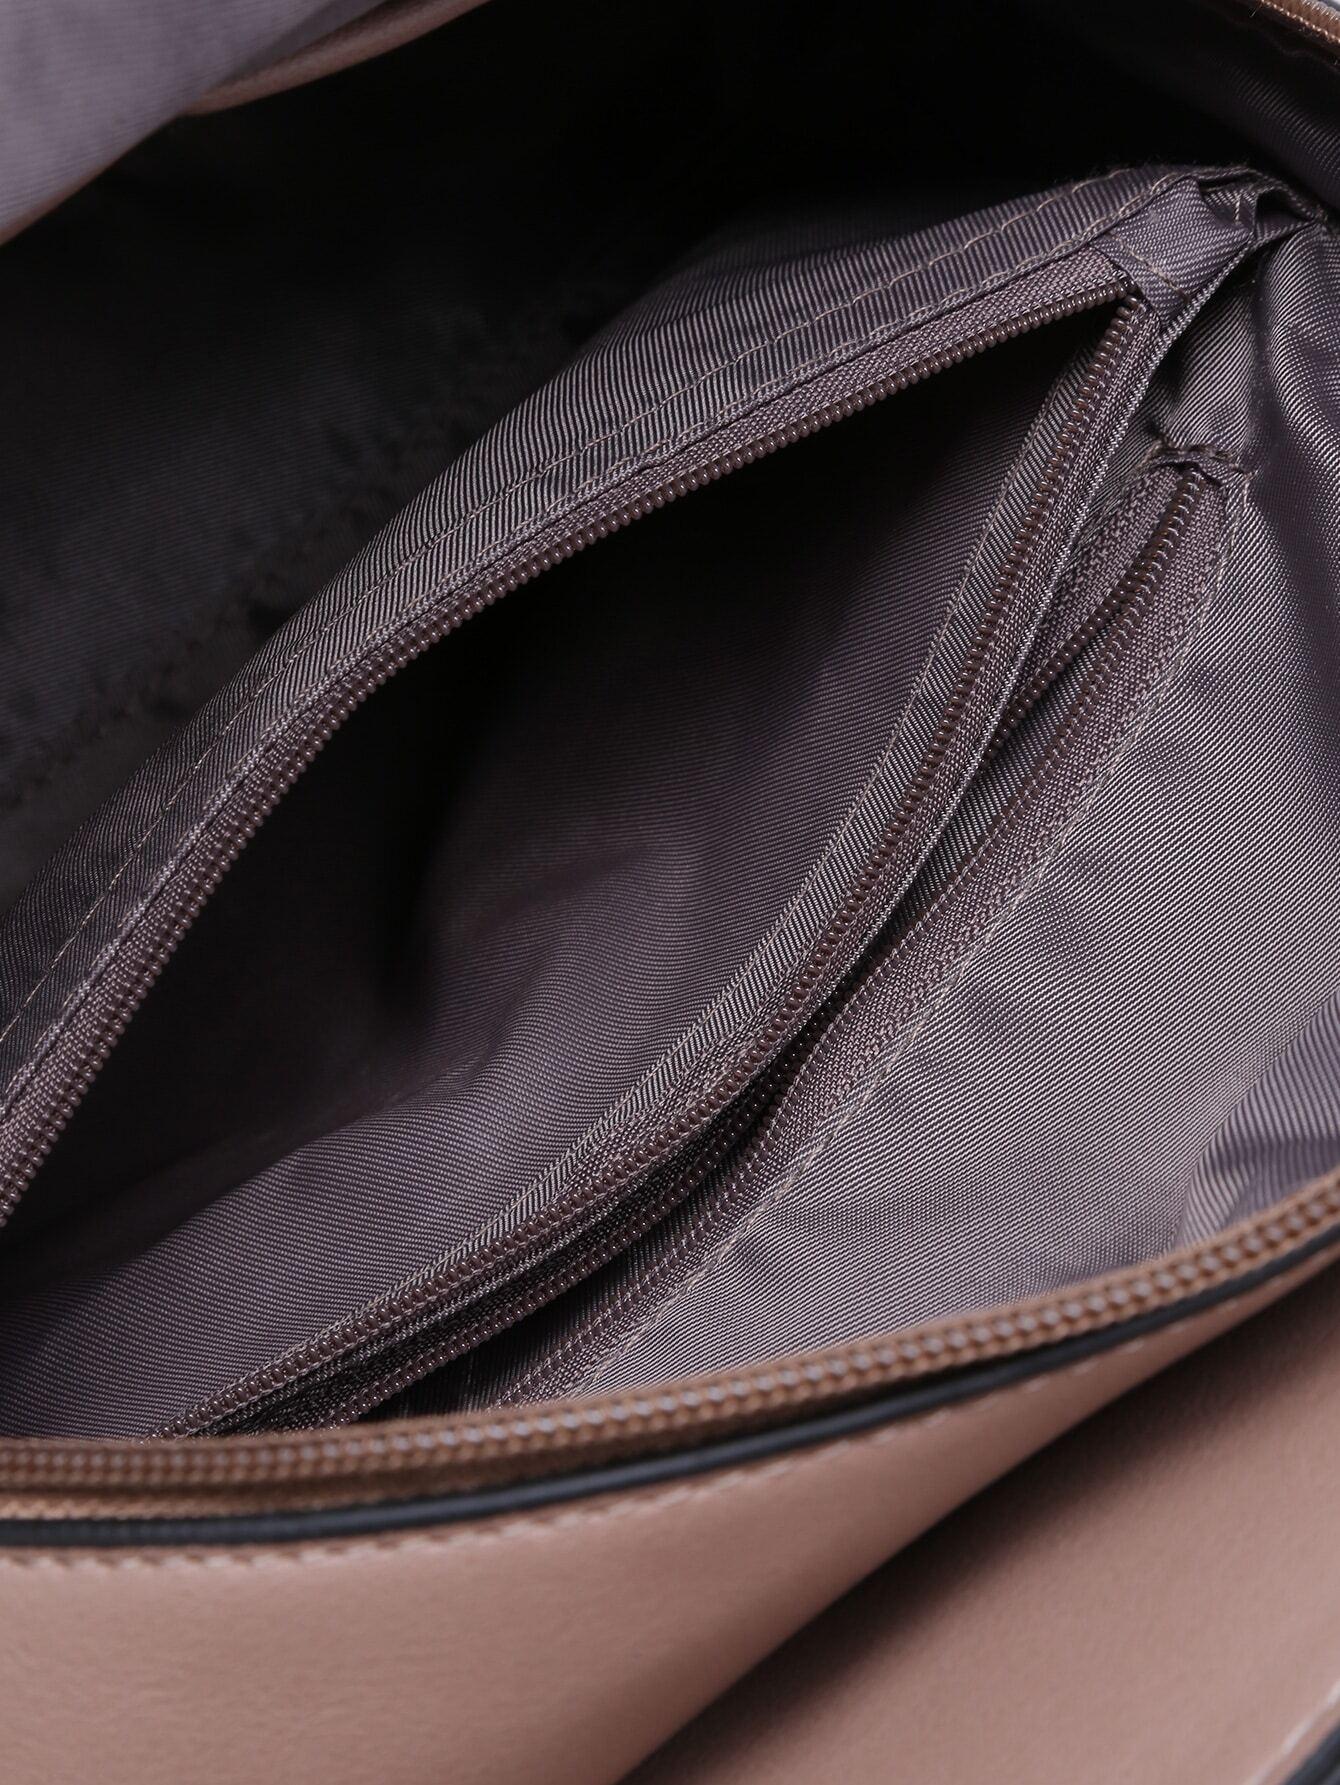 bag161027917_2